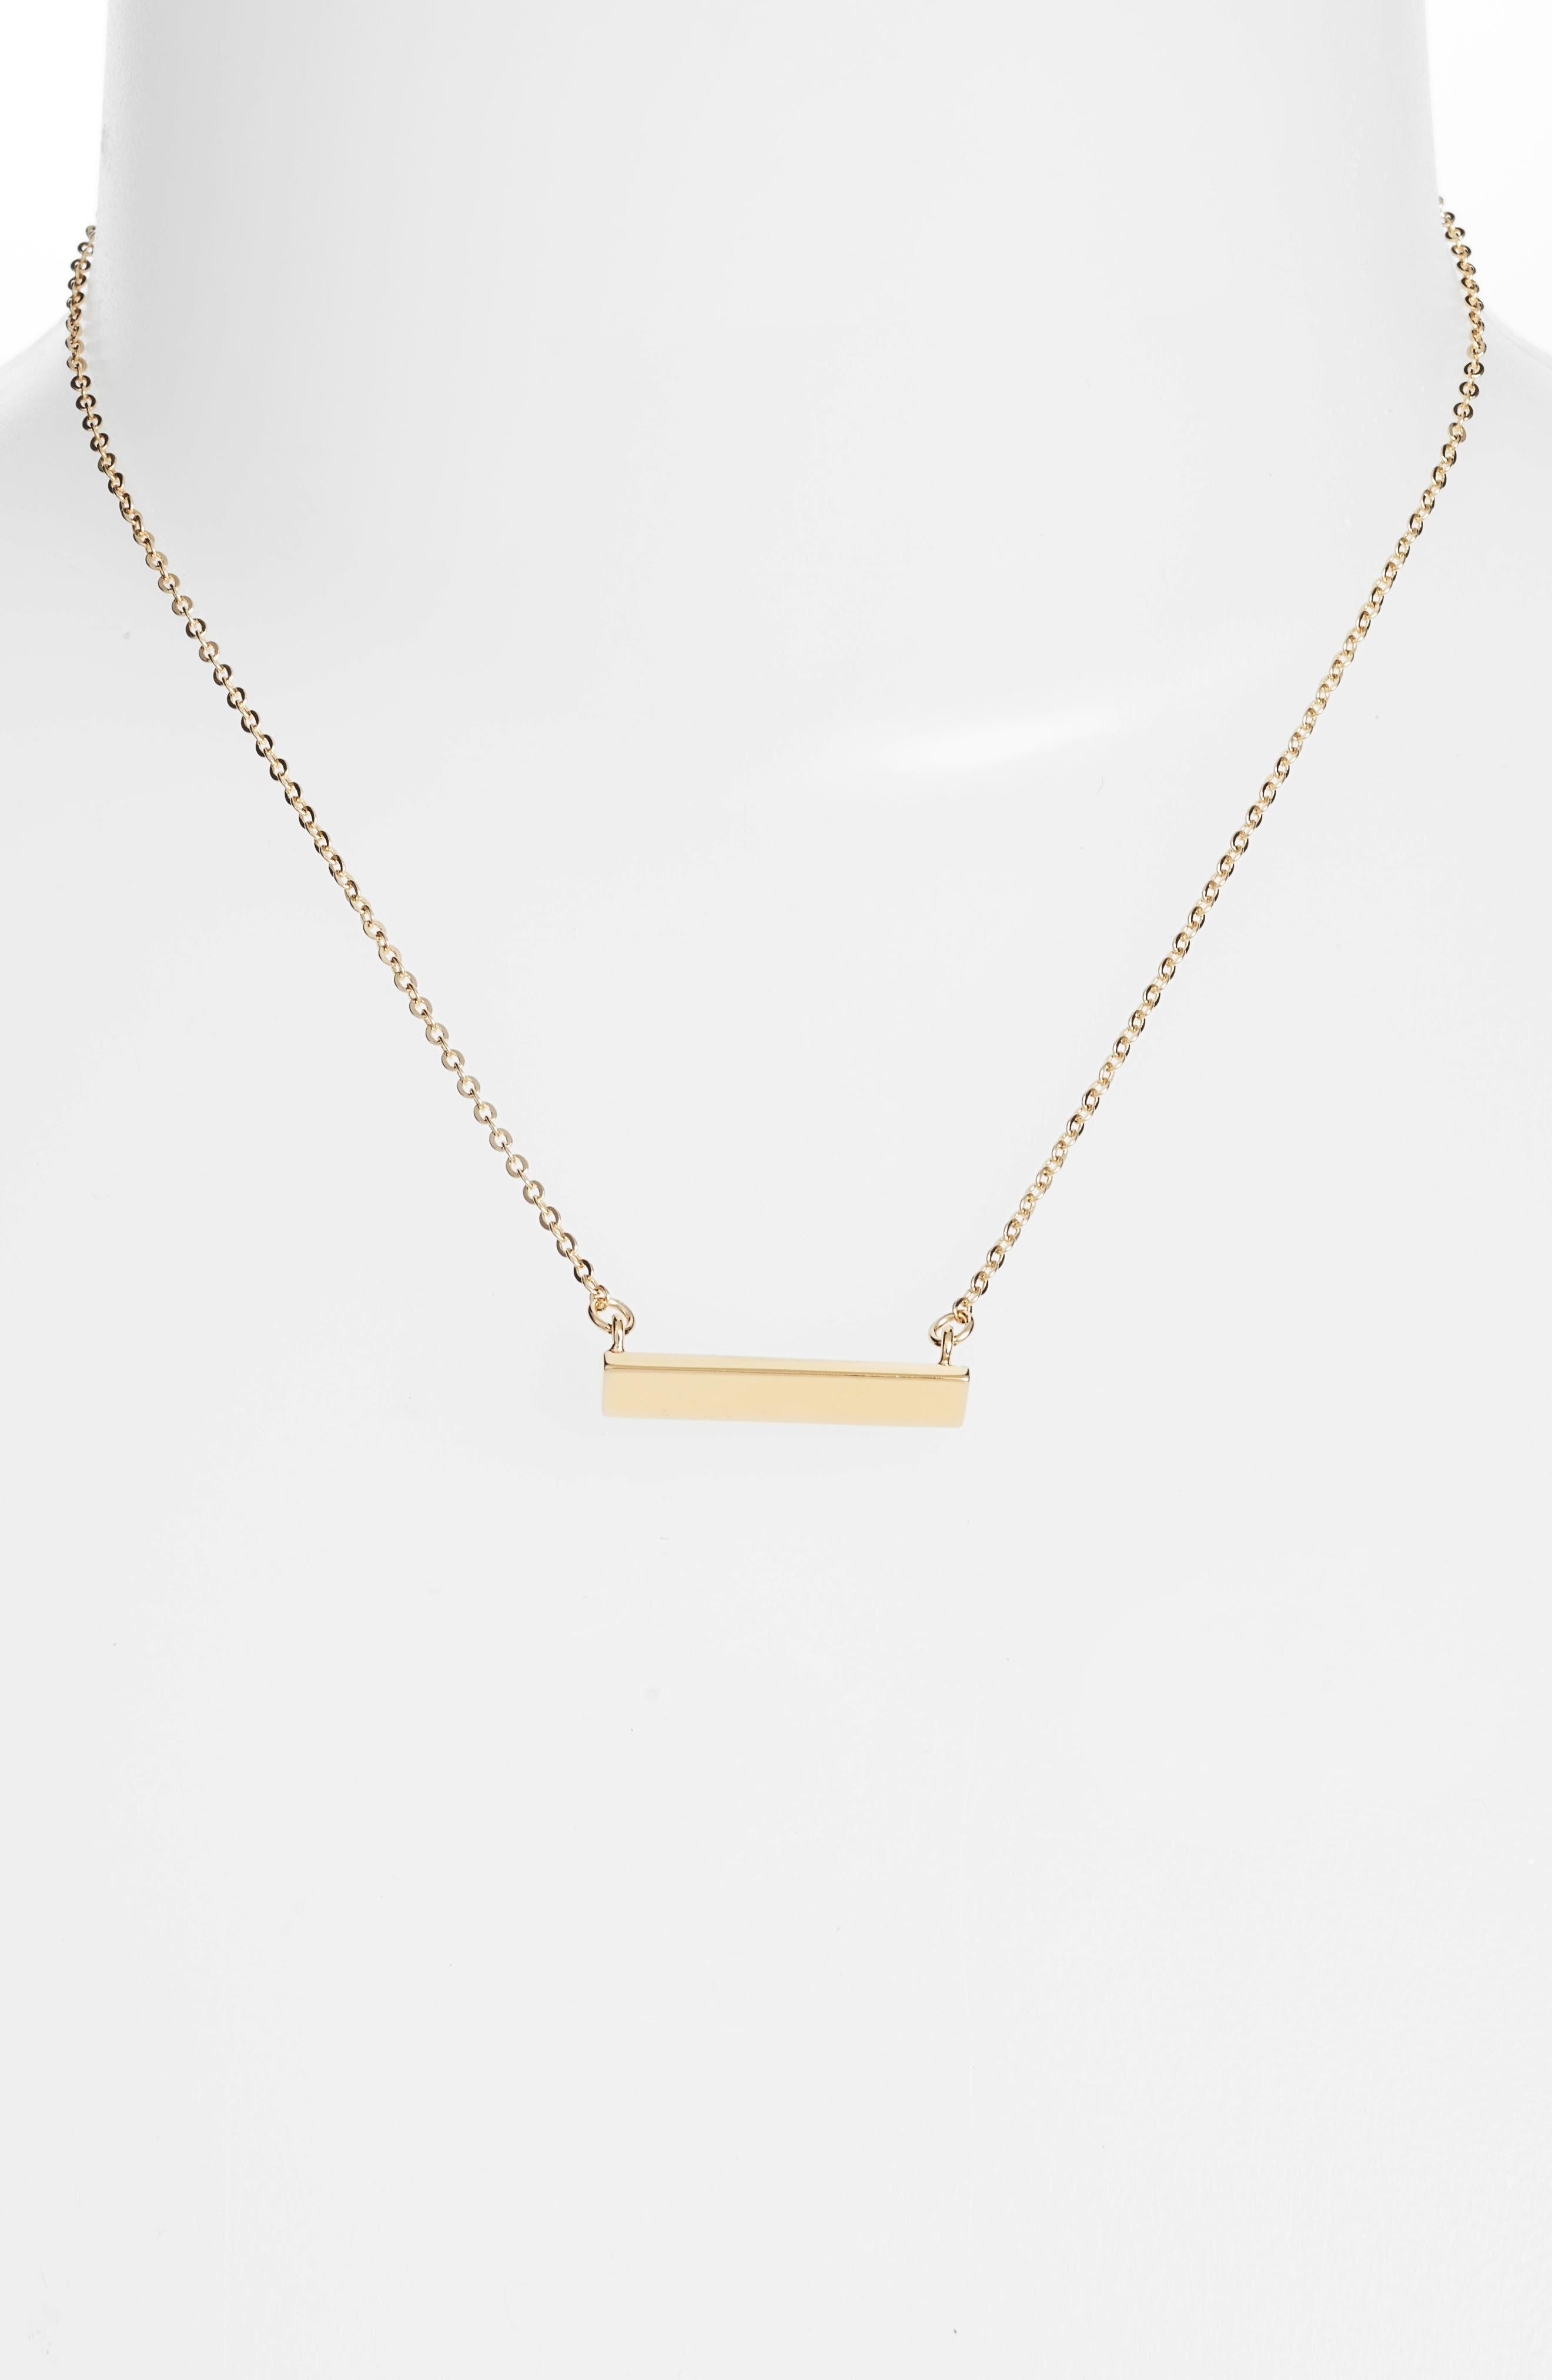 Diamond Shaped Bar Pendant Necklace,                         Main,                         color, GOLD